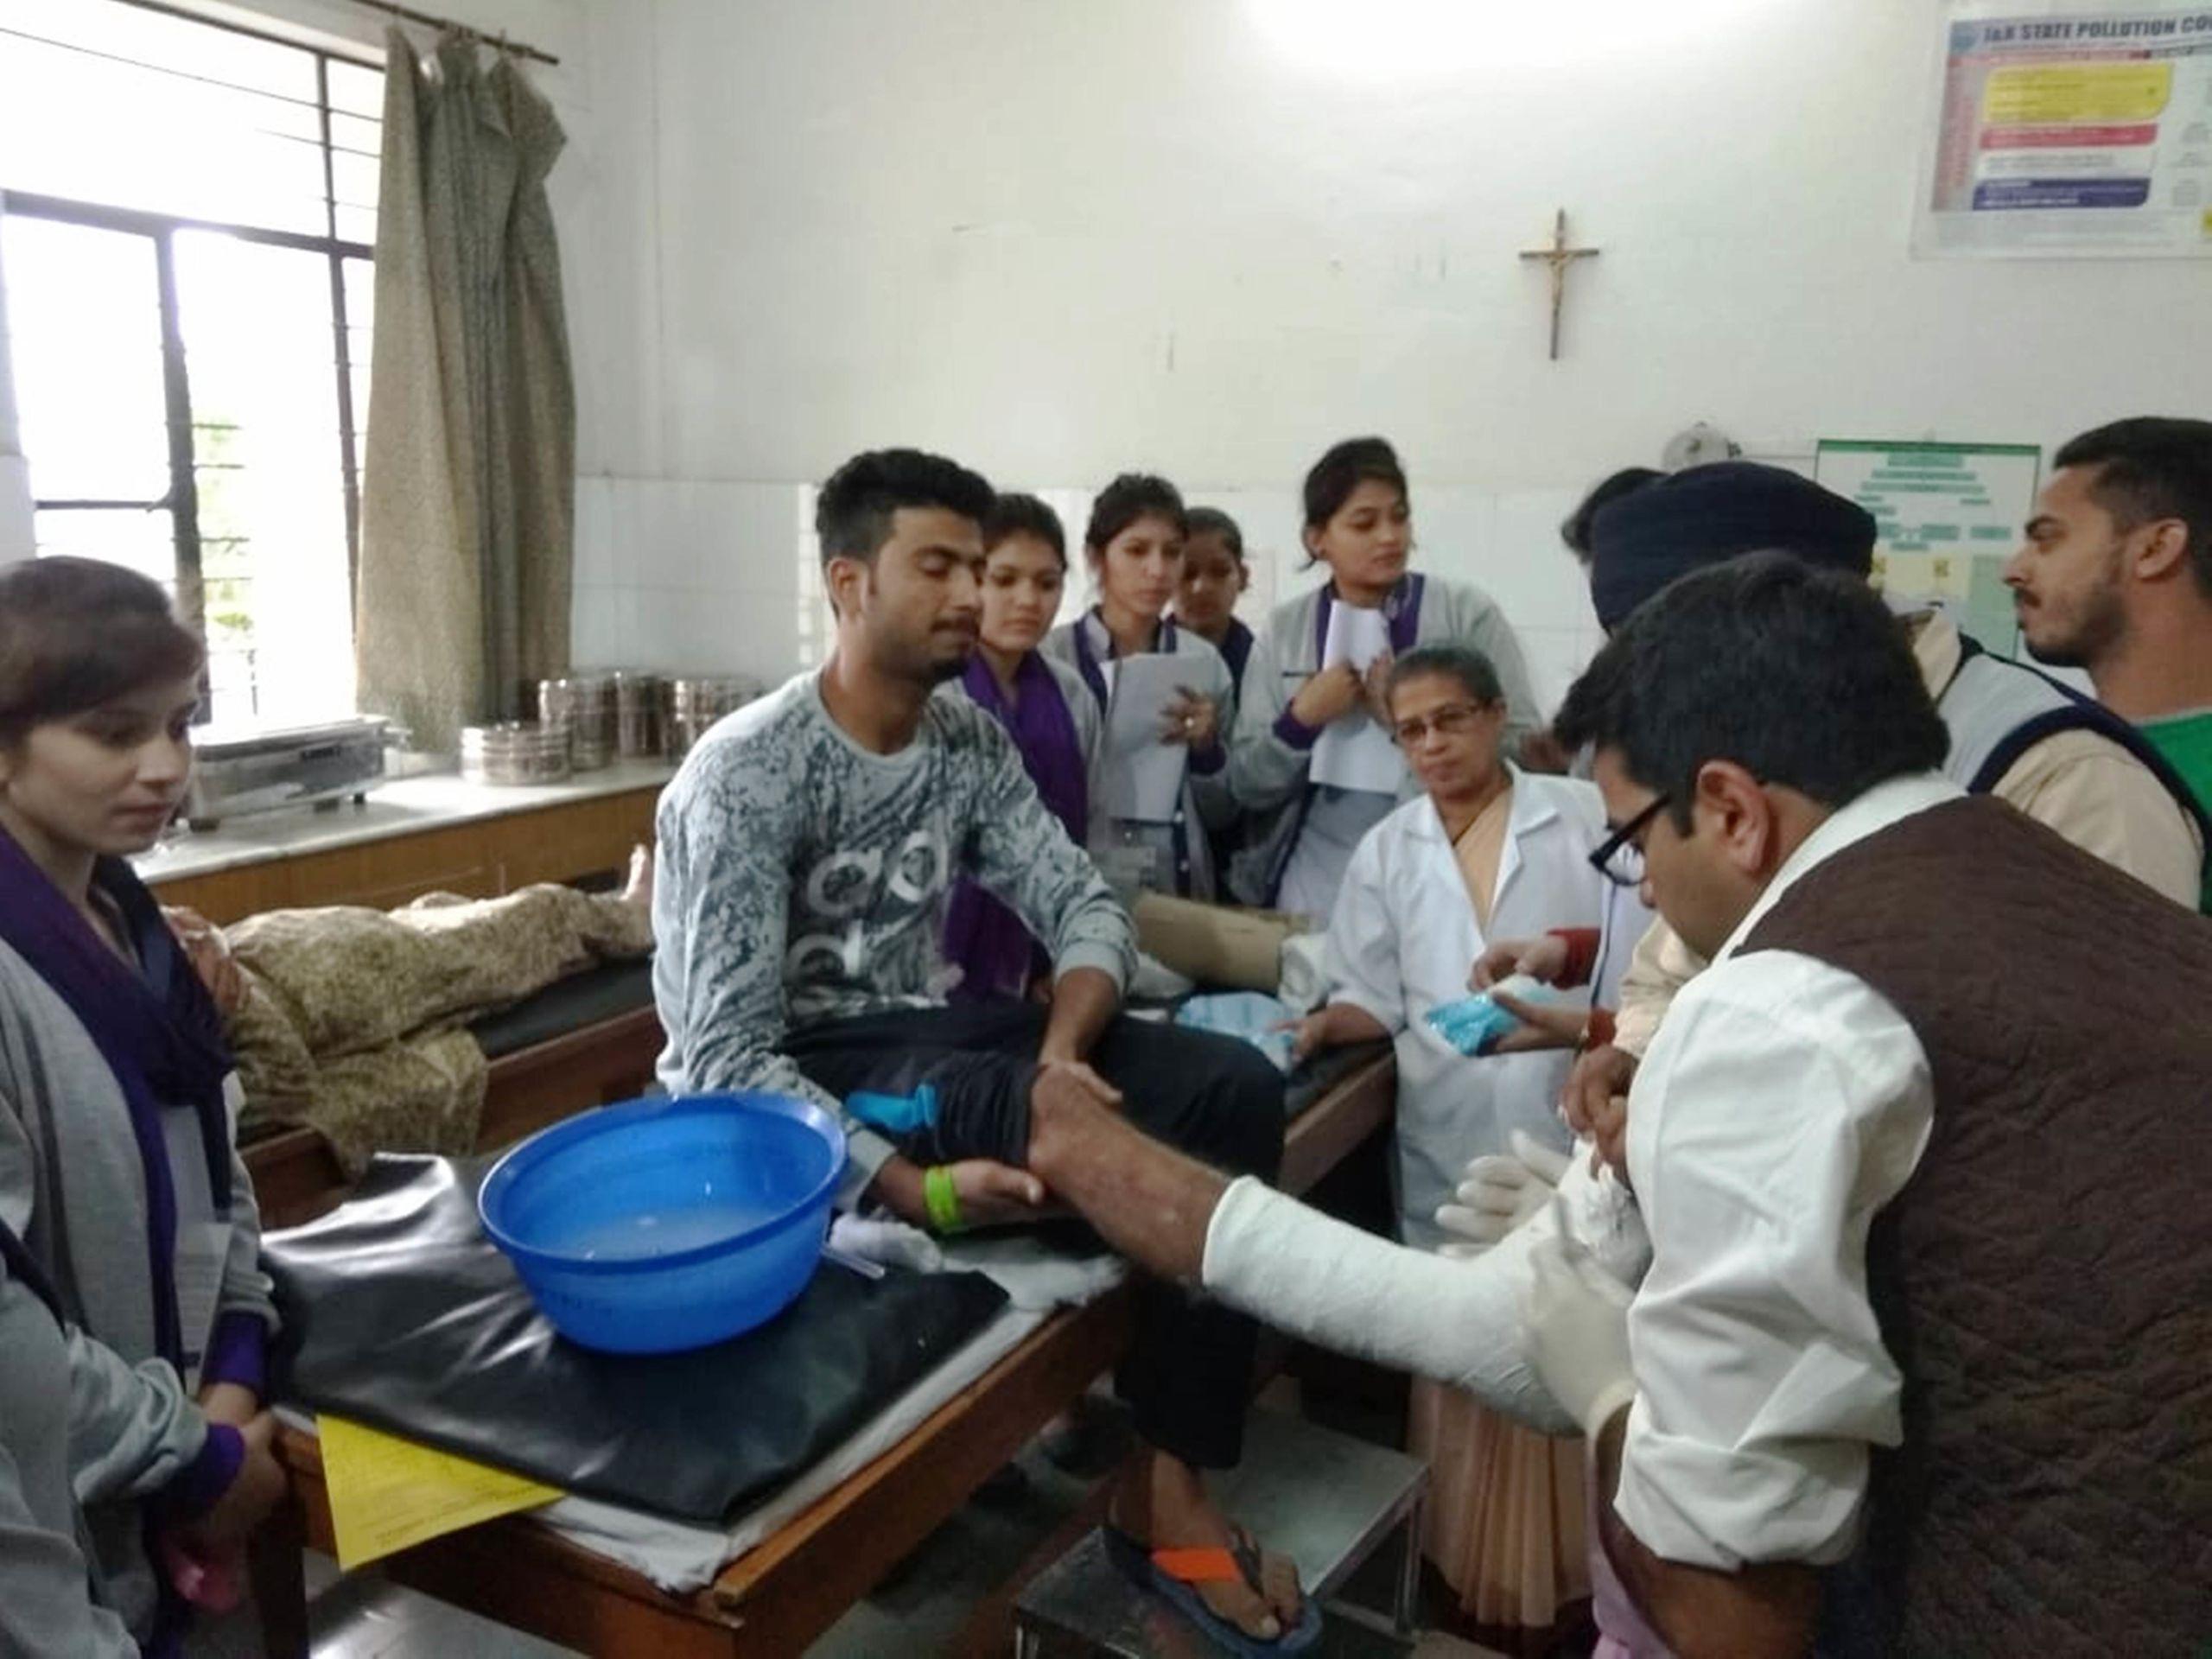 St. Joseph's Community Hospital medicos treat a patient.